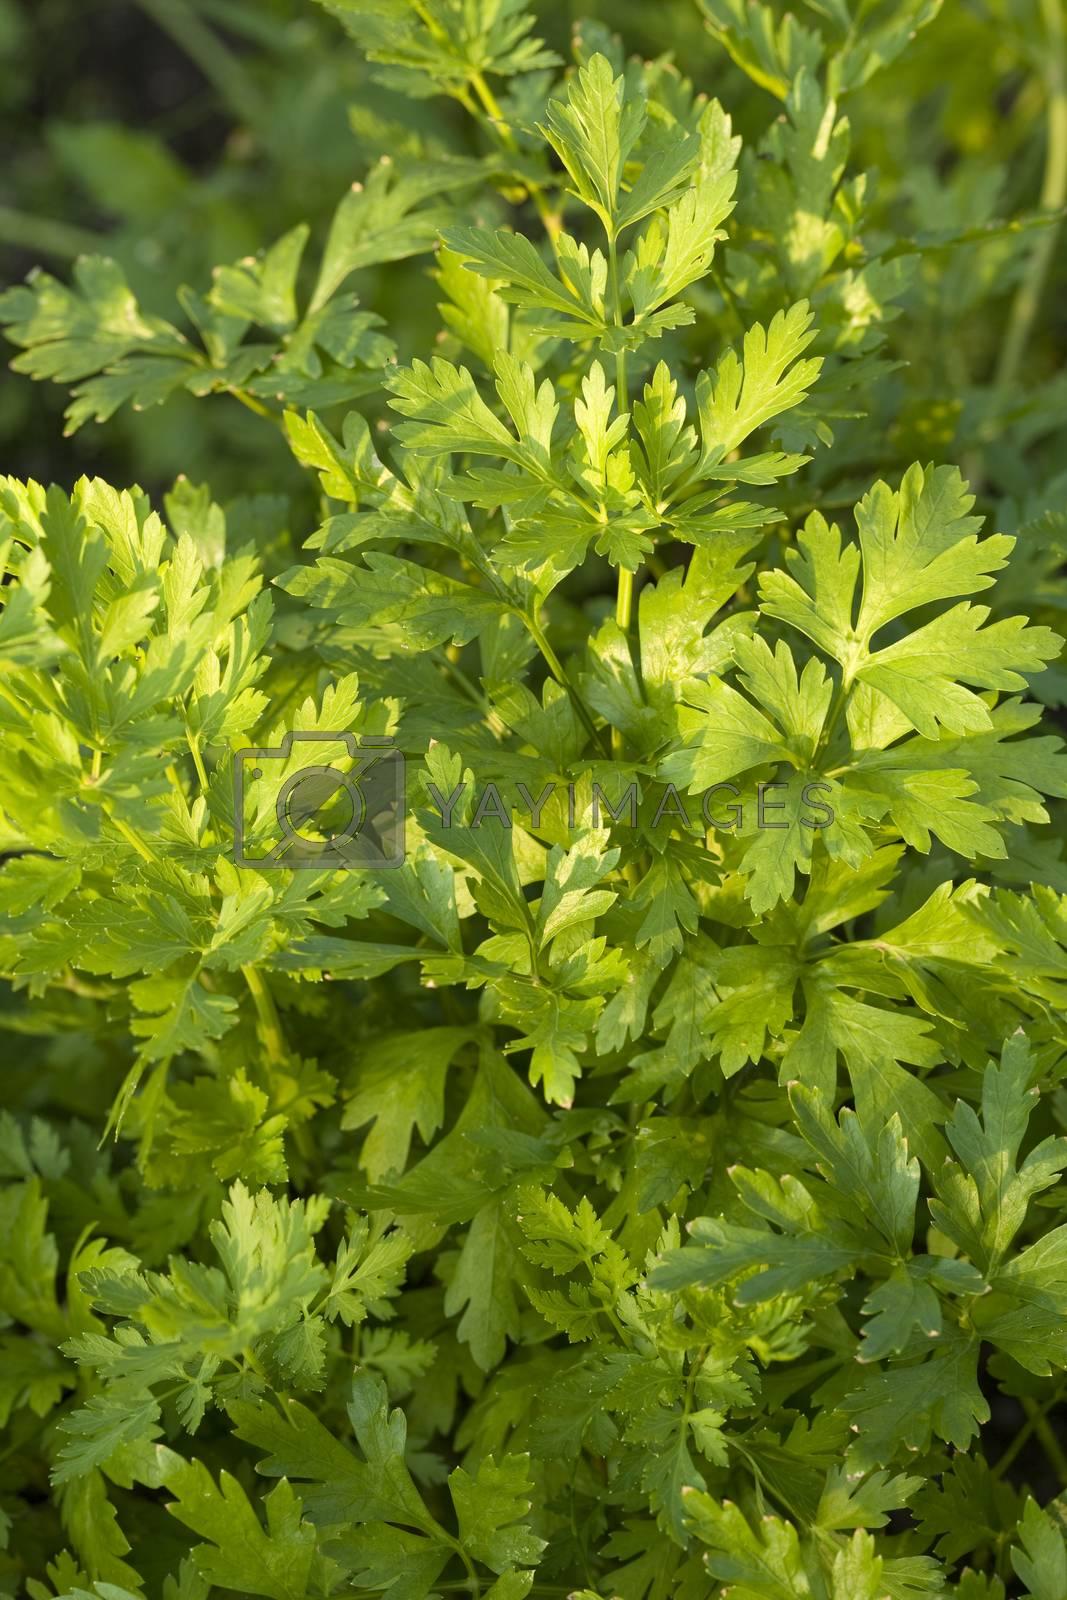 cluster green parsley (Petroselinum crispum) as background